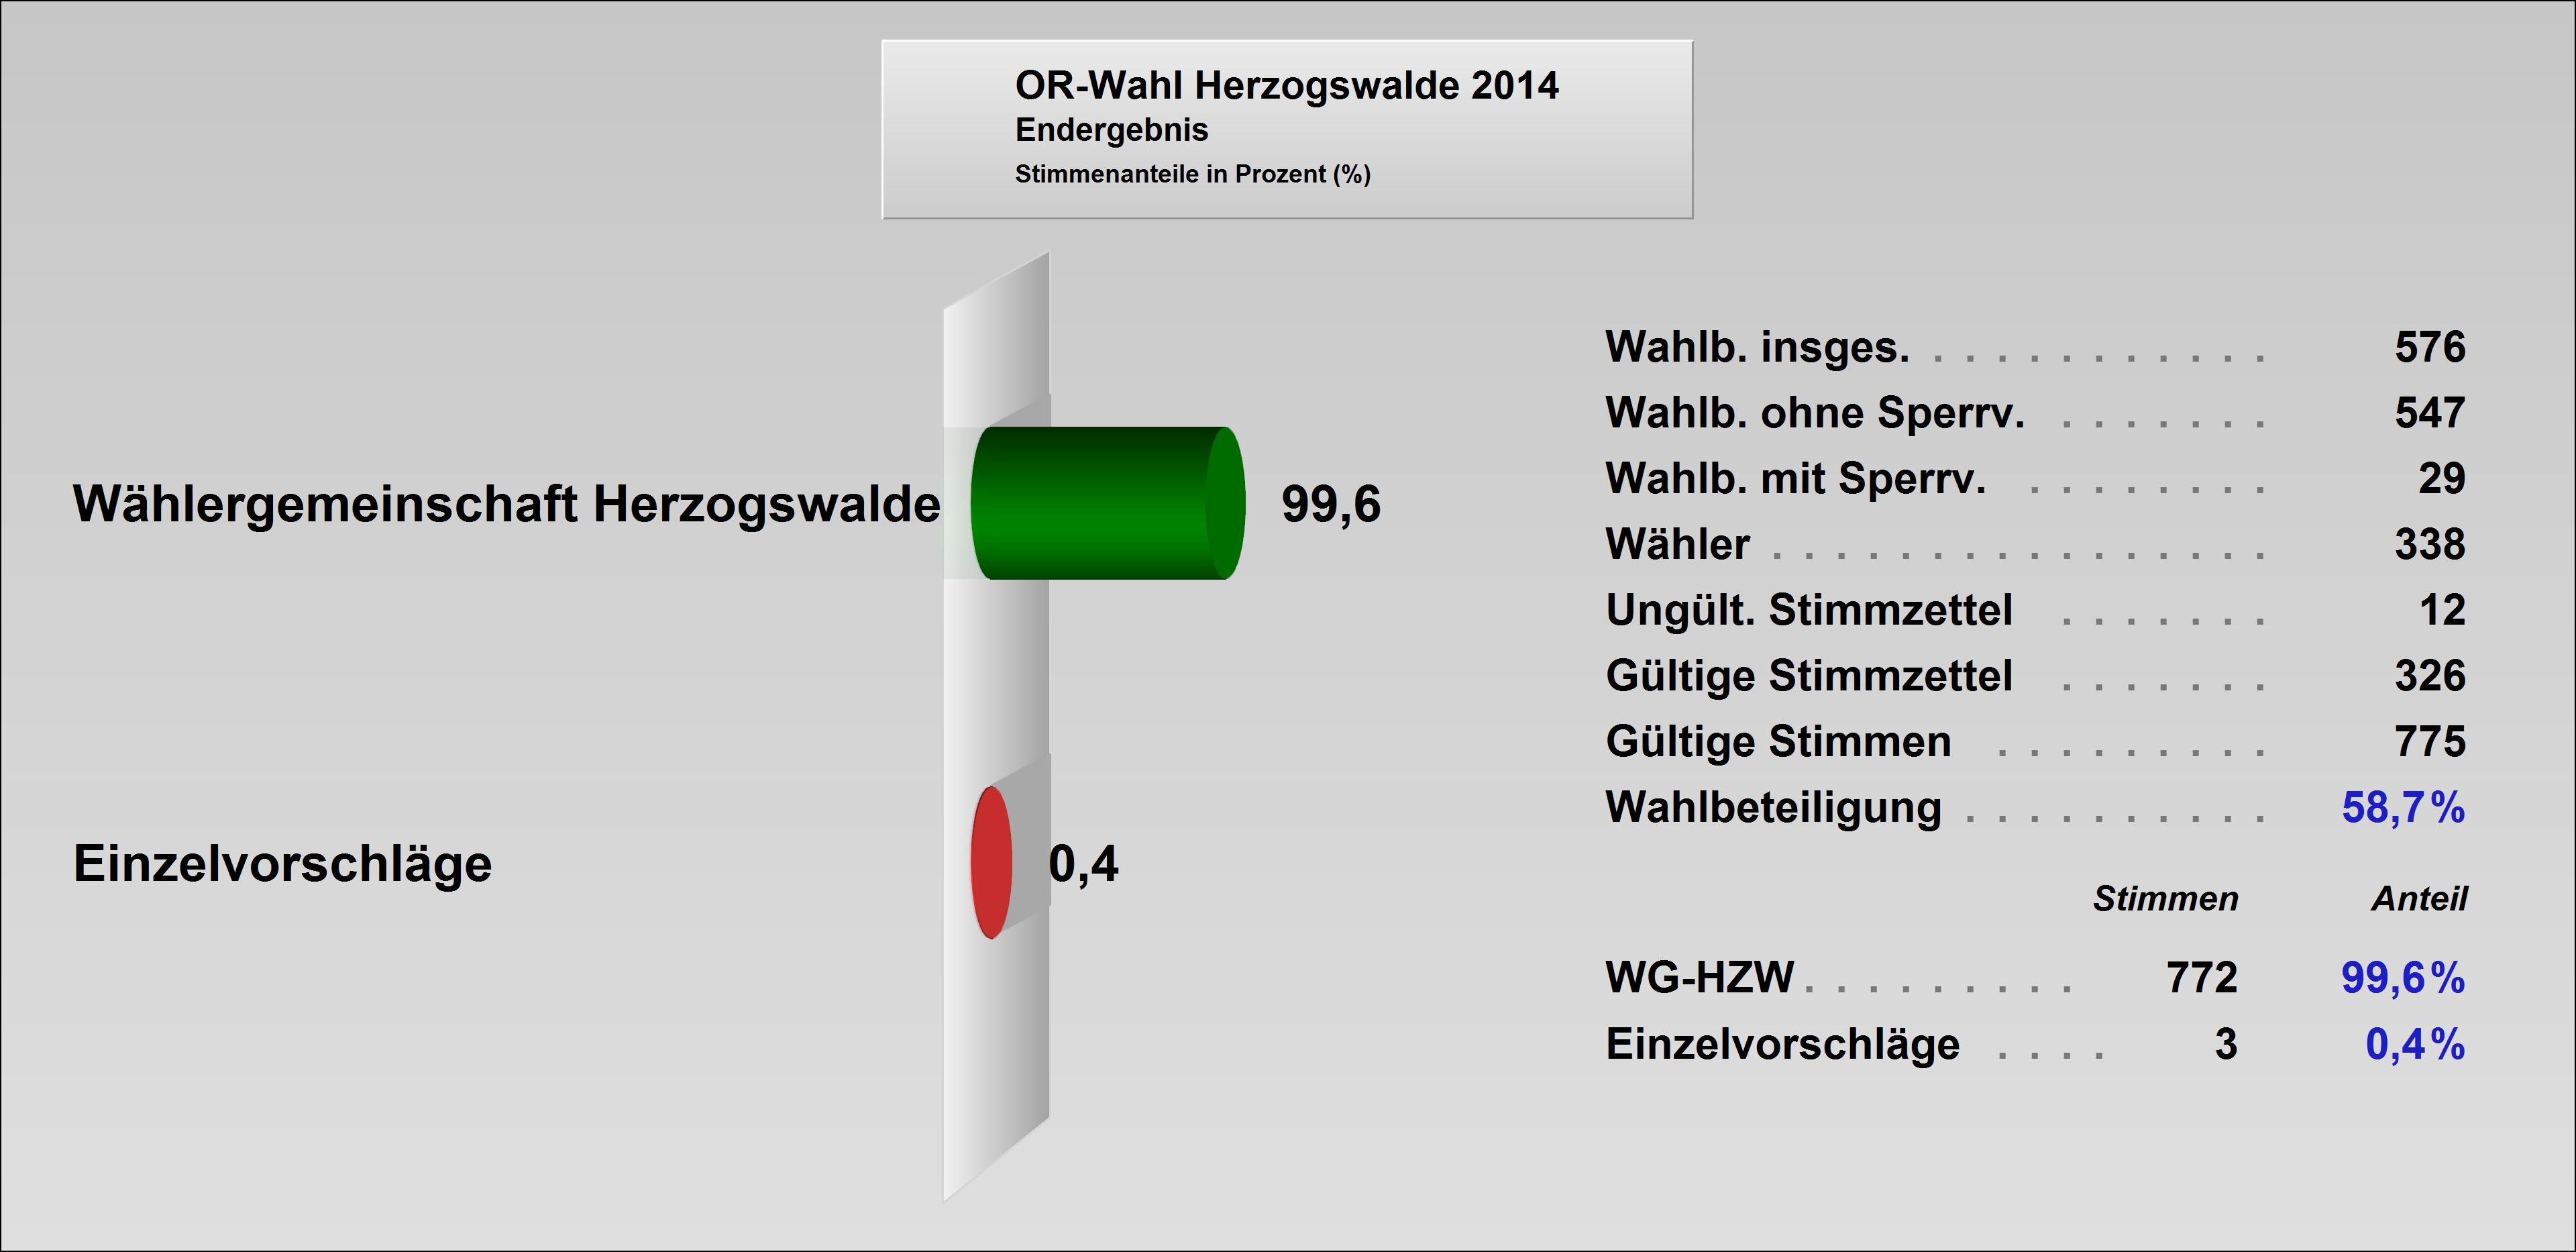 ORat2014-Herzogswalde.jpg